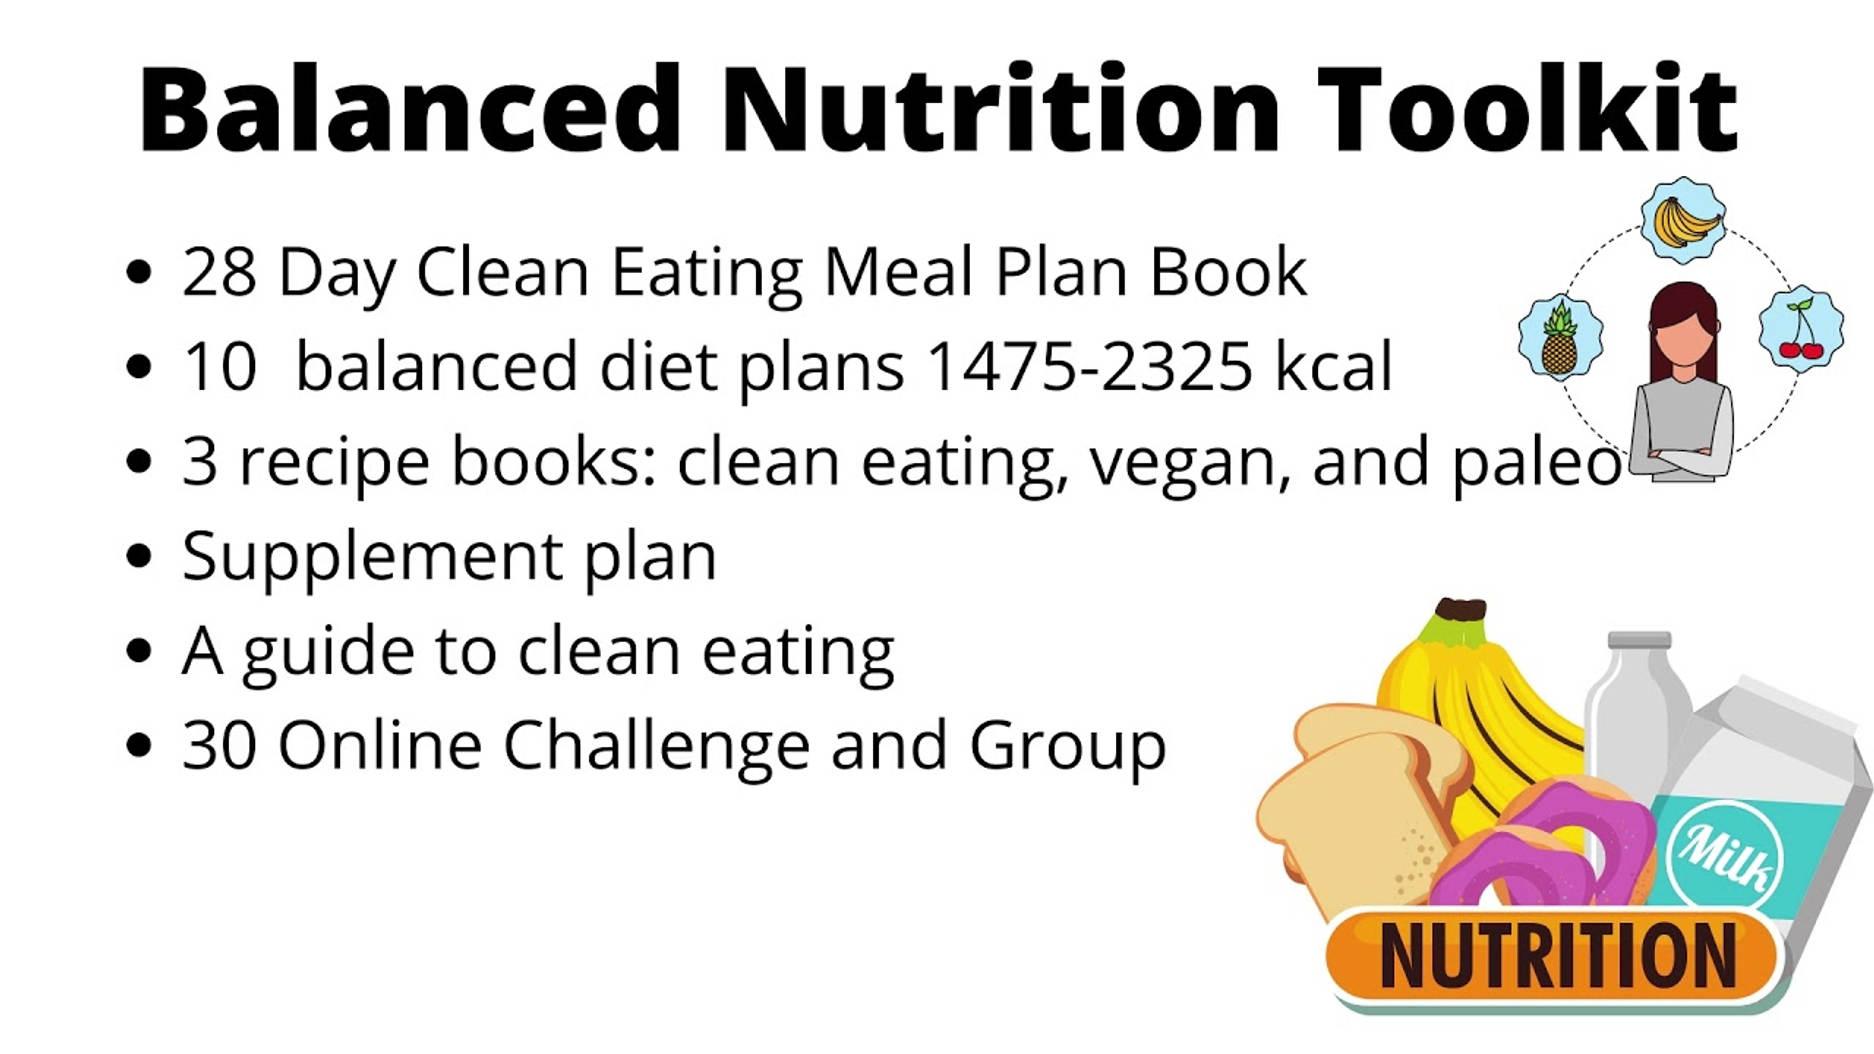 Balanced Nutrition Toolkit